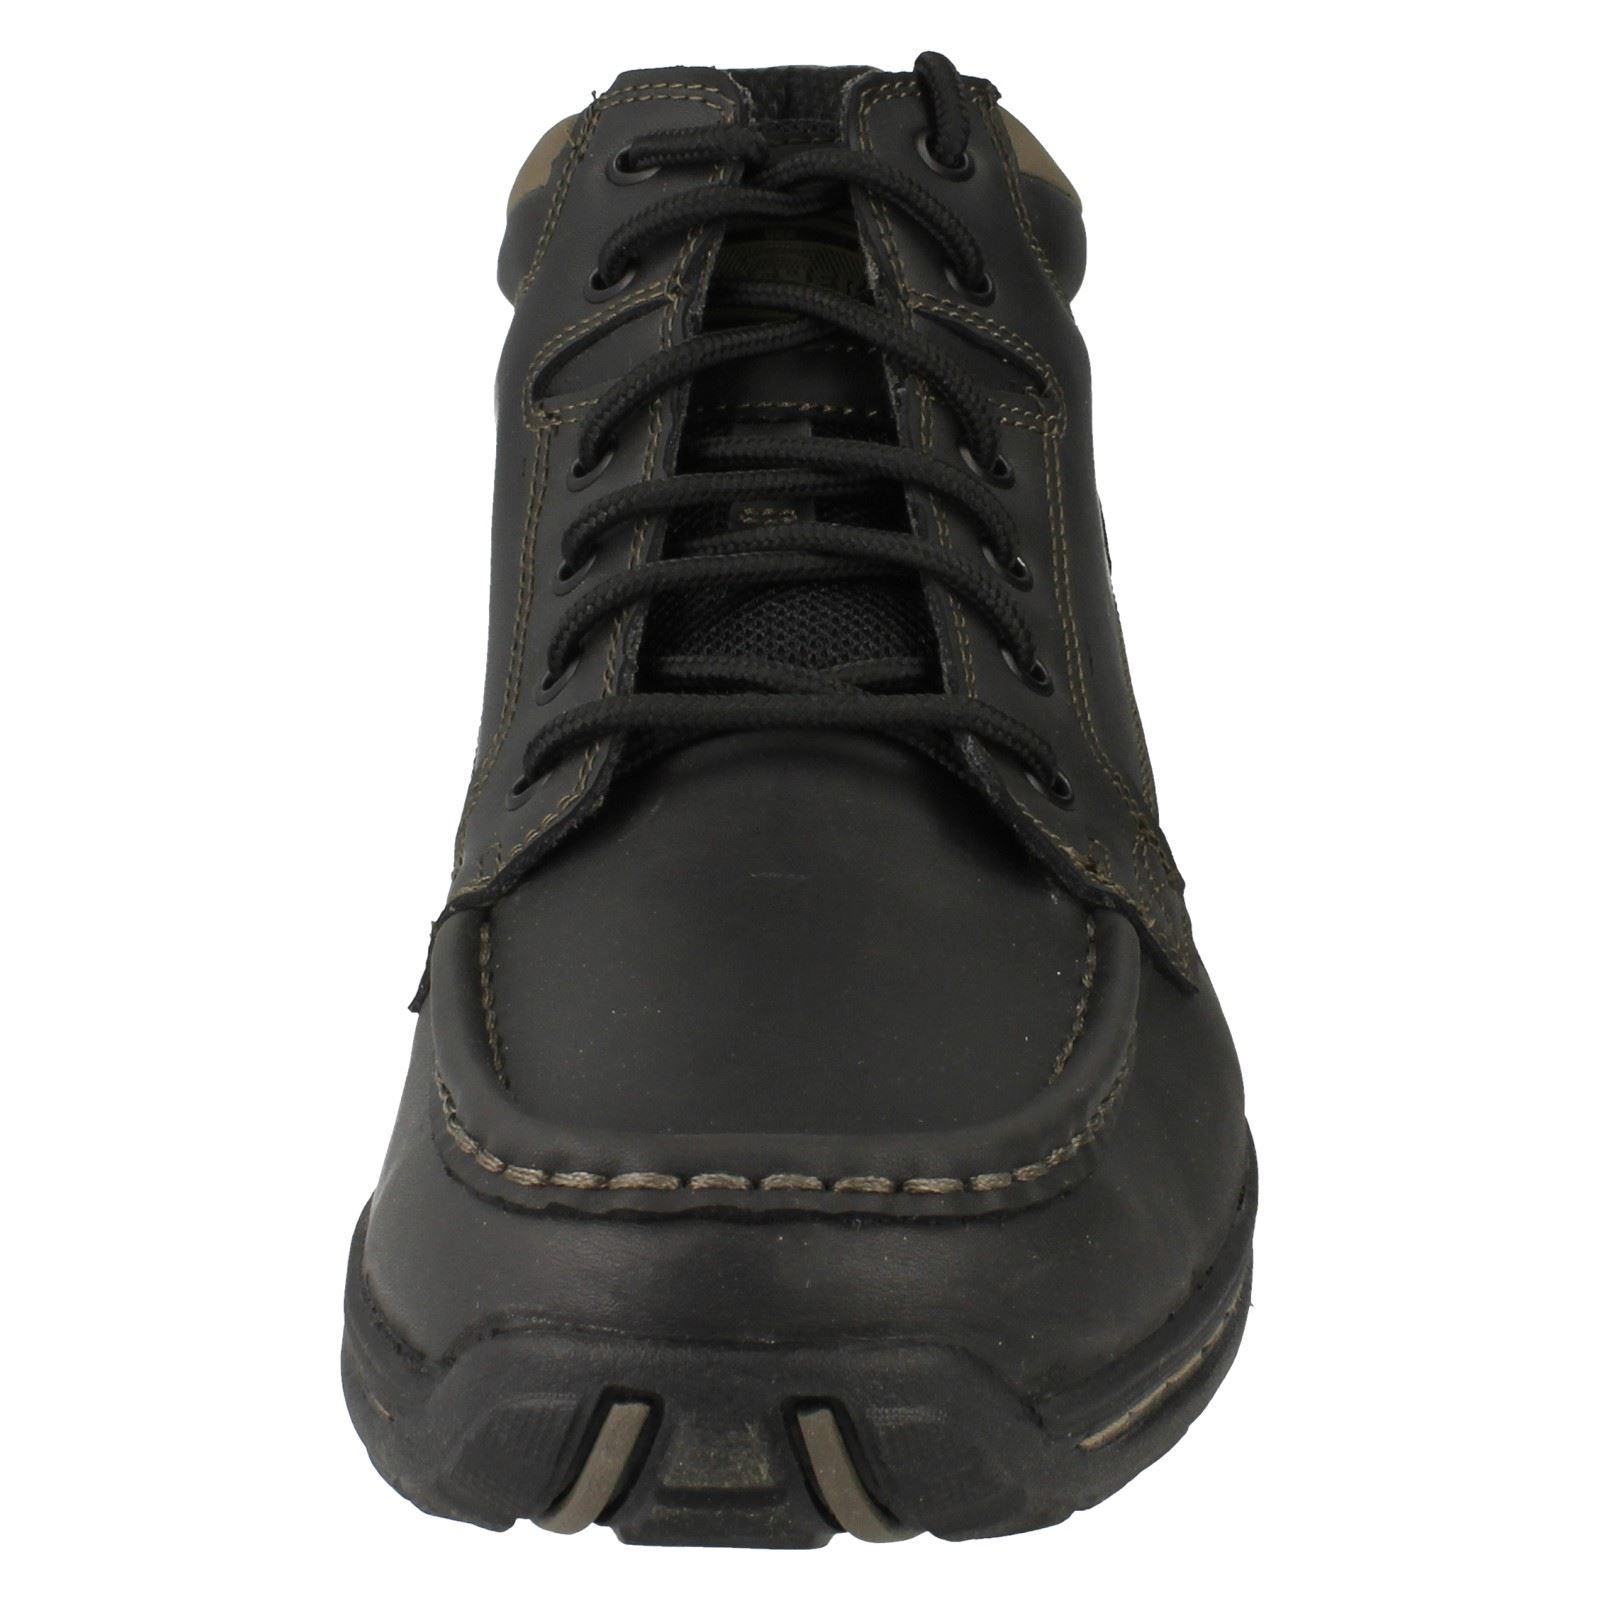 Uomo Skechers Stiefel - Deside Deside - 5299a1